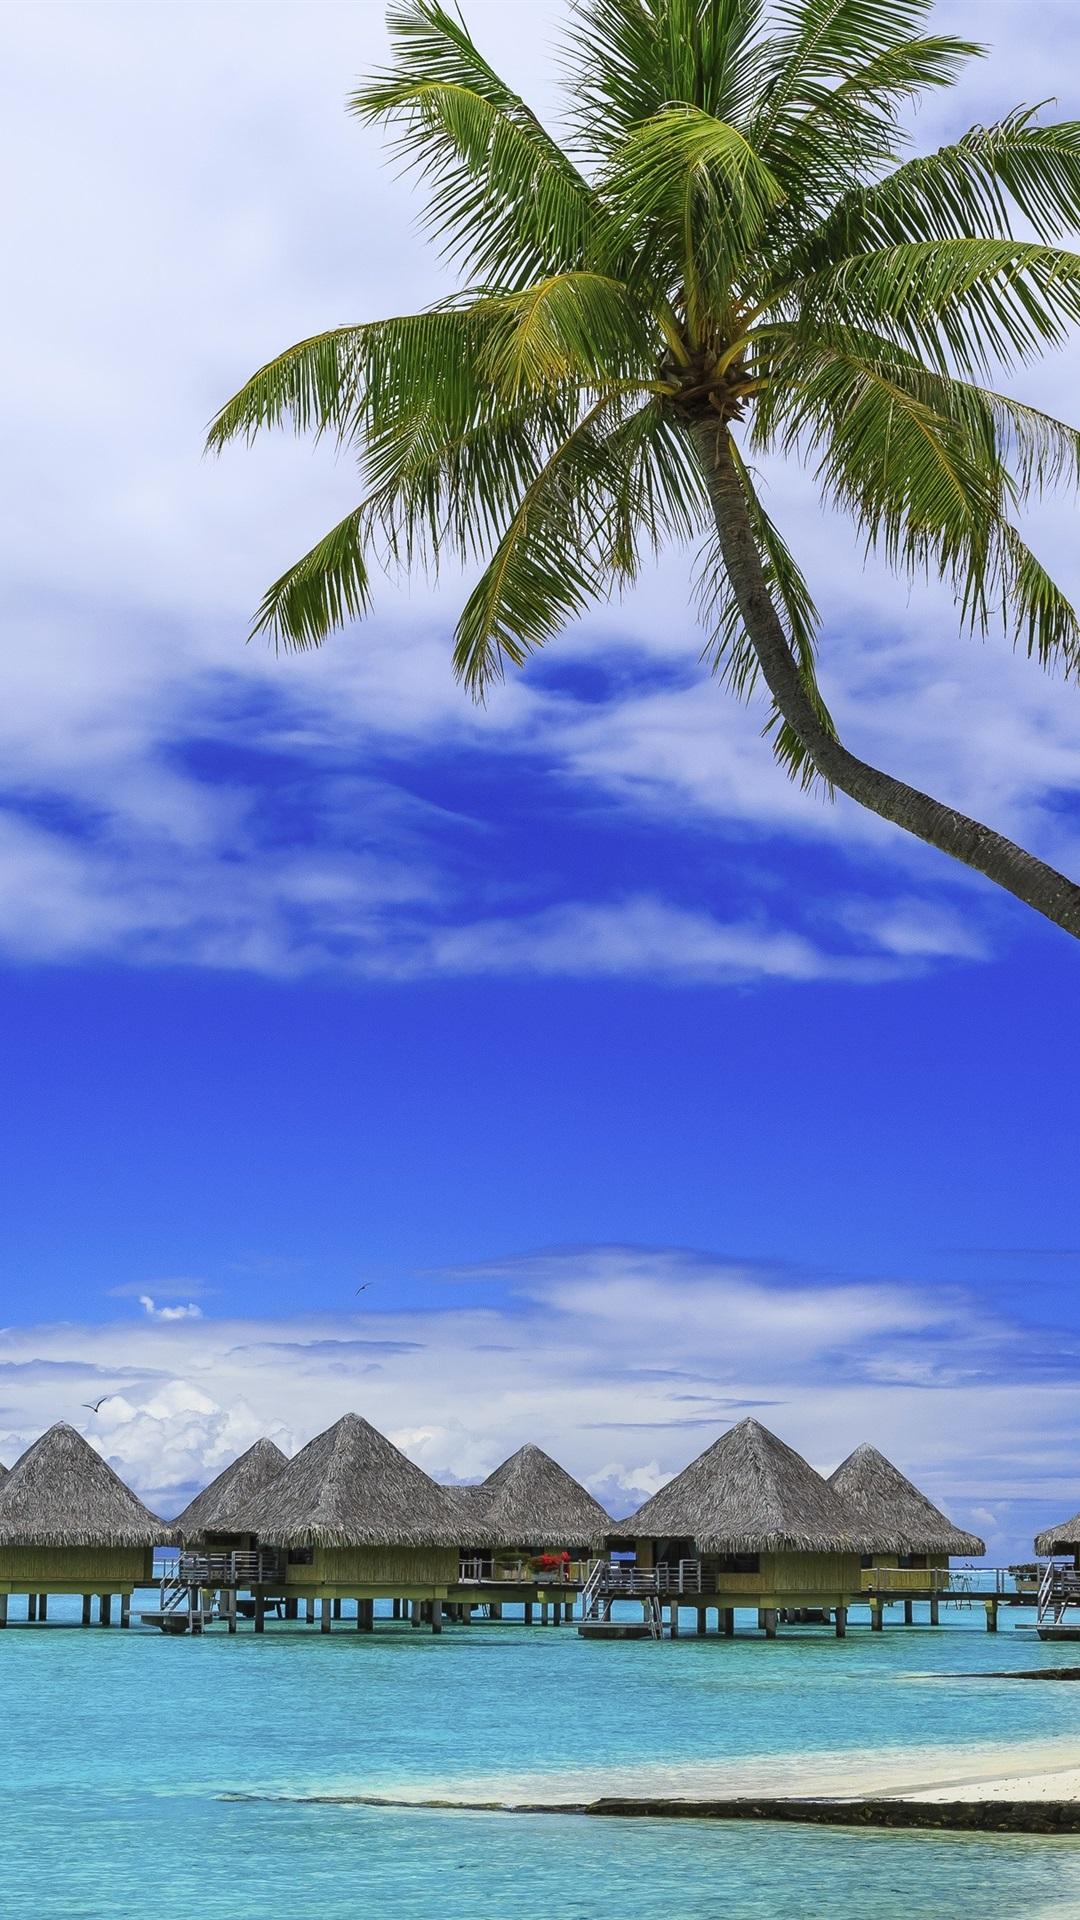 Palm Trees Tropical Summer Paradise Beach Sea Resort